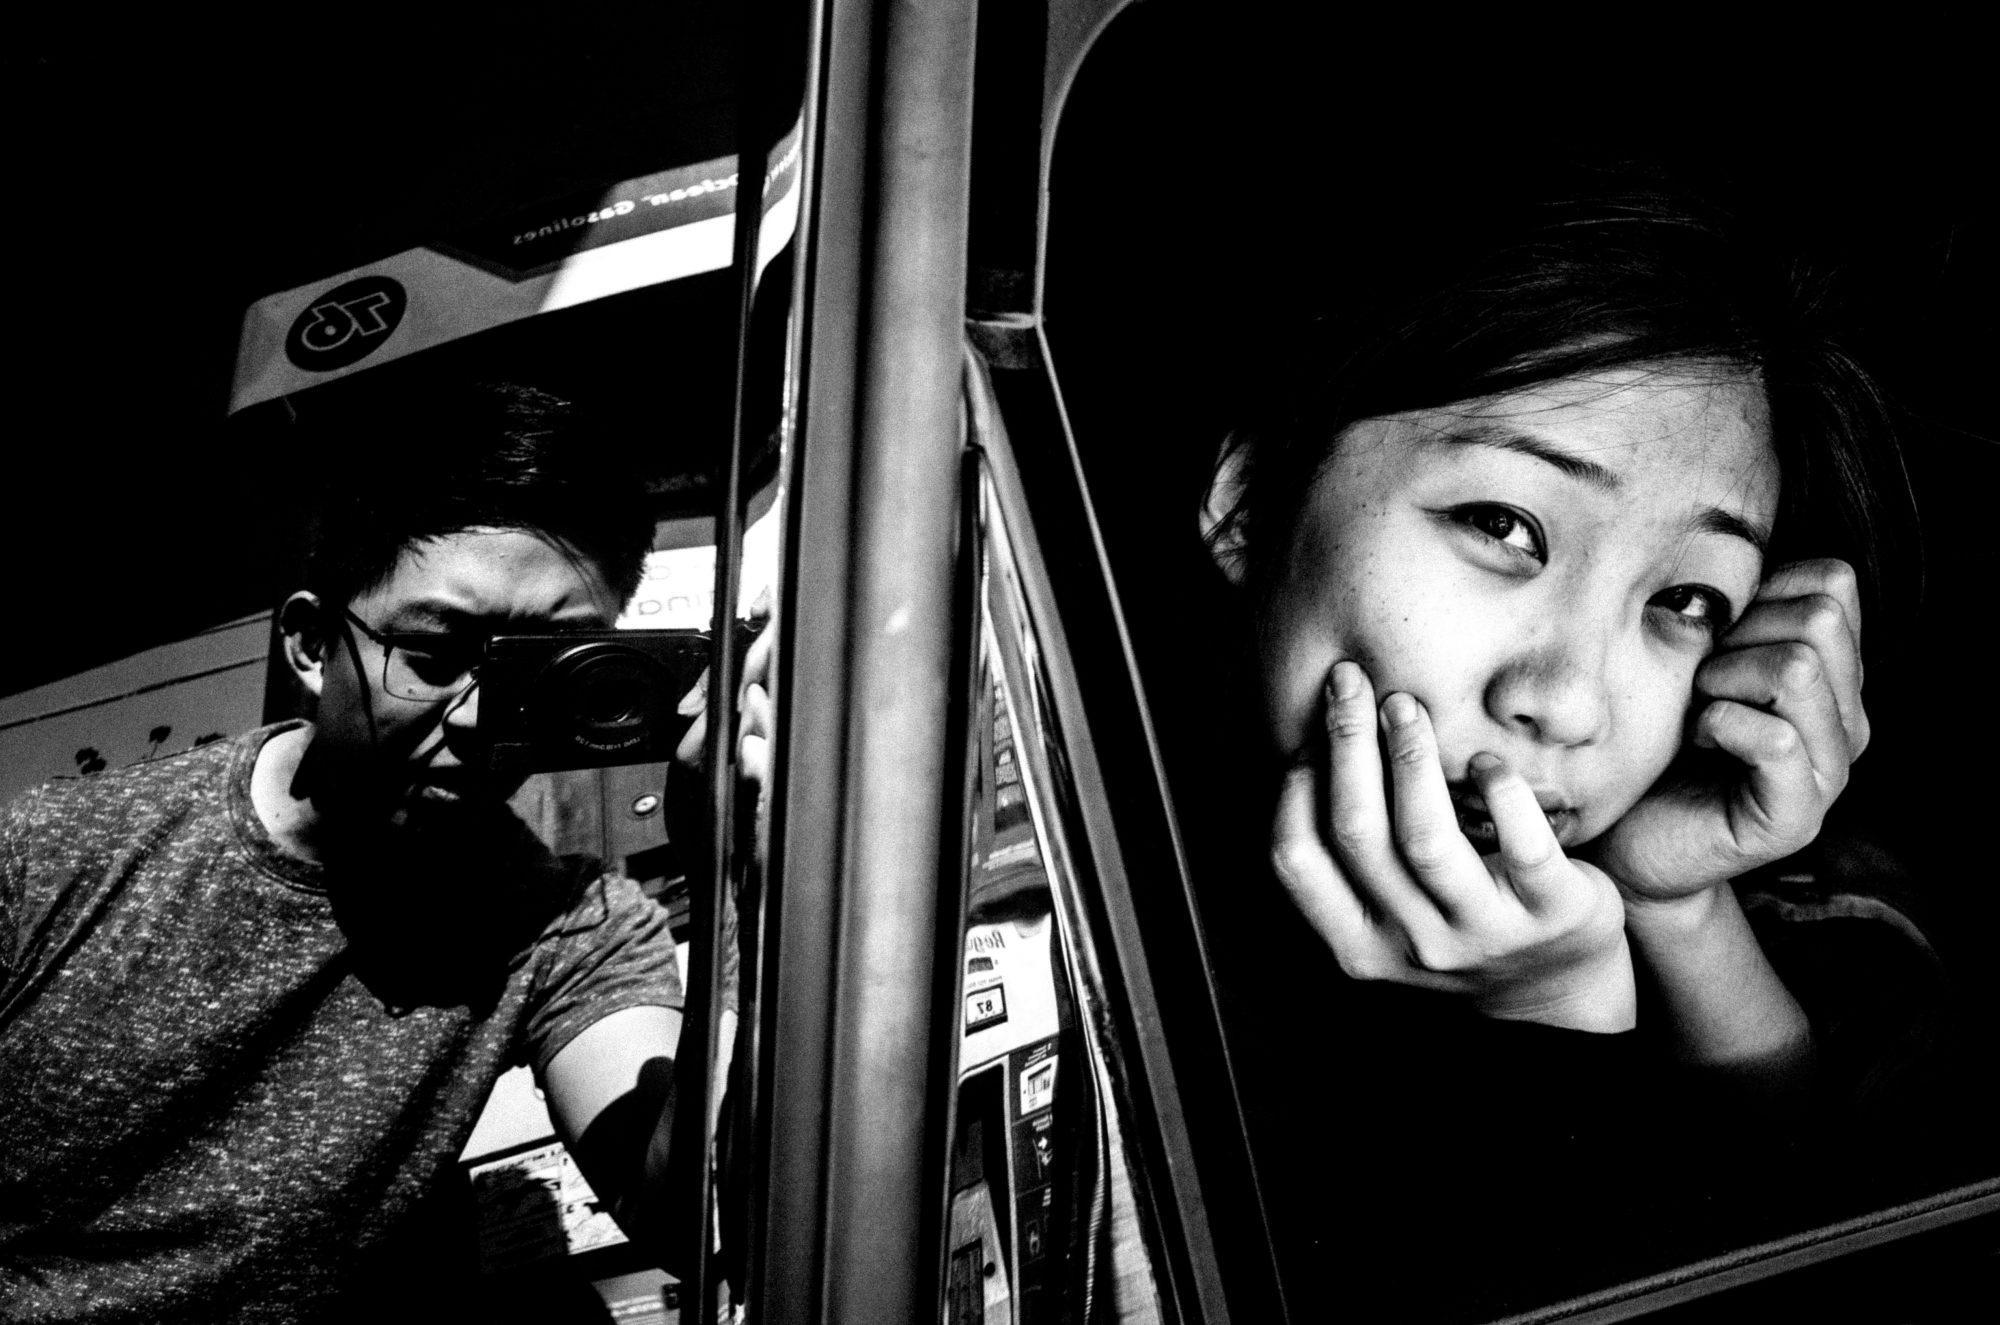 eric kim photography - cindy project- berkeley - self portrait - selfie